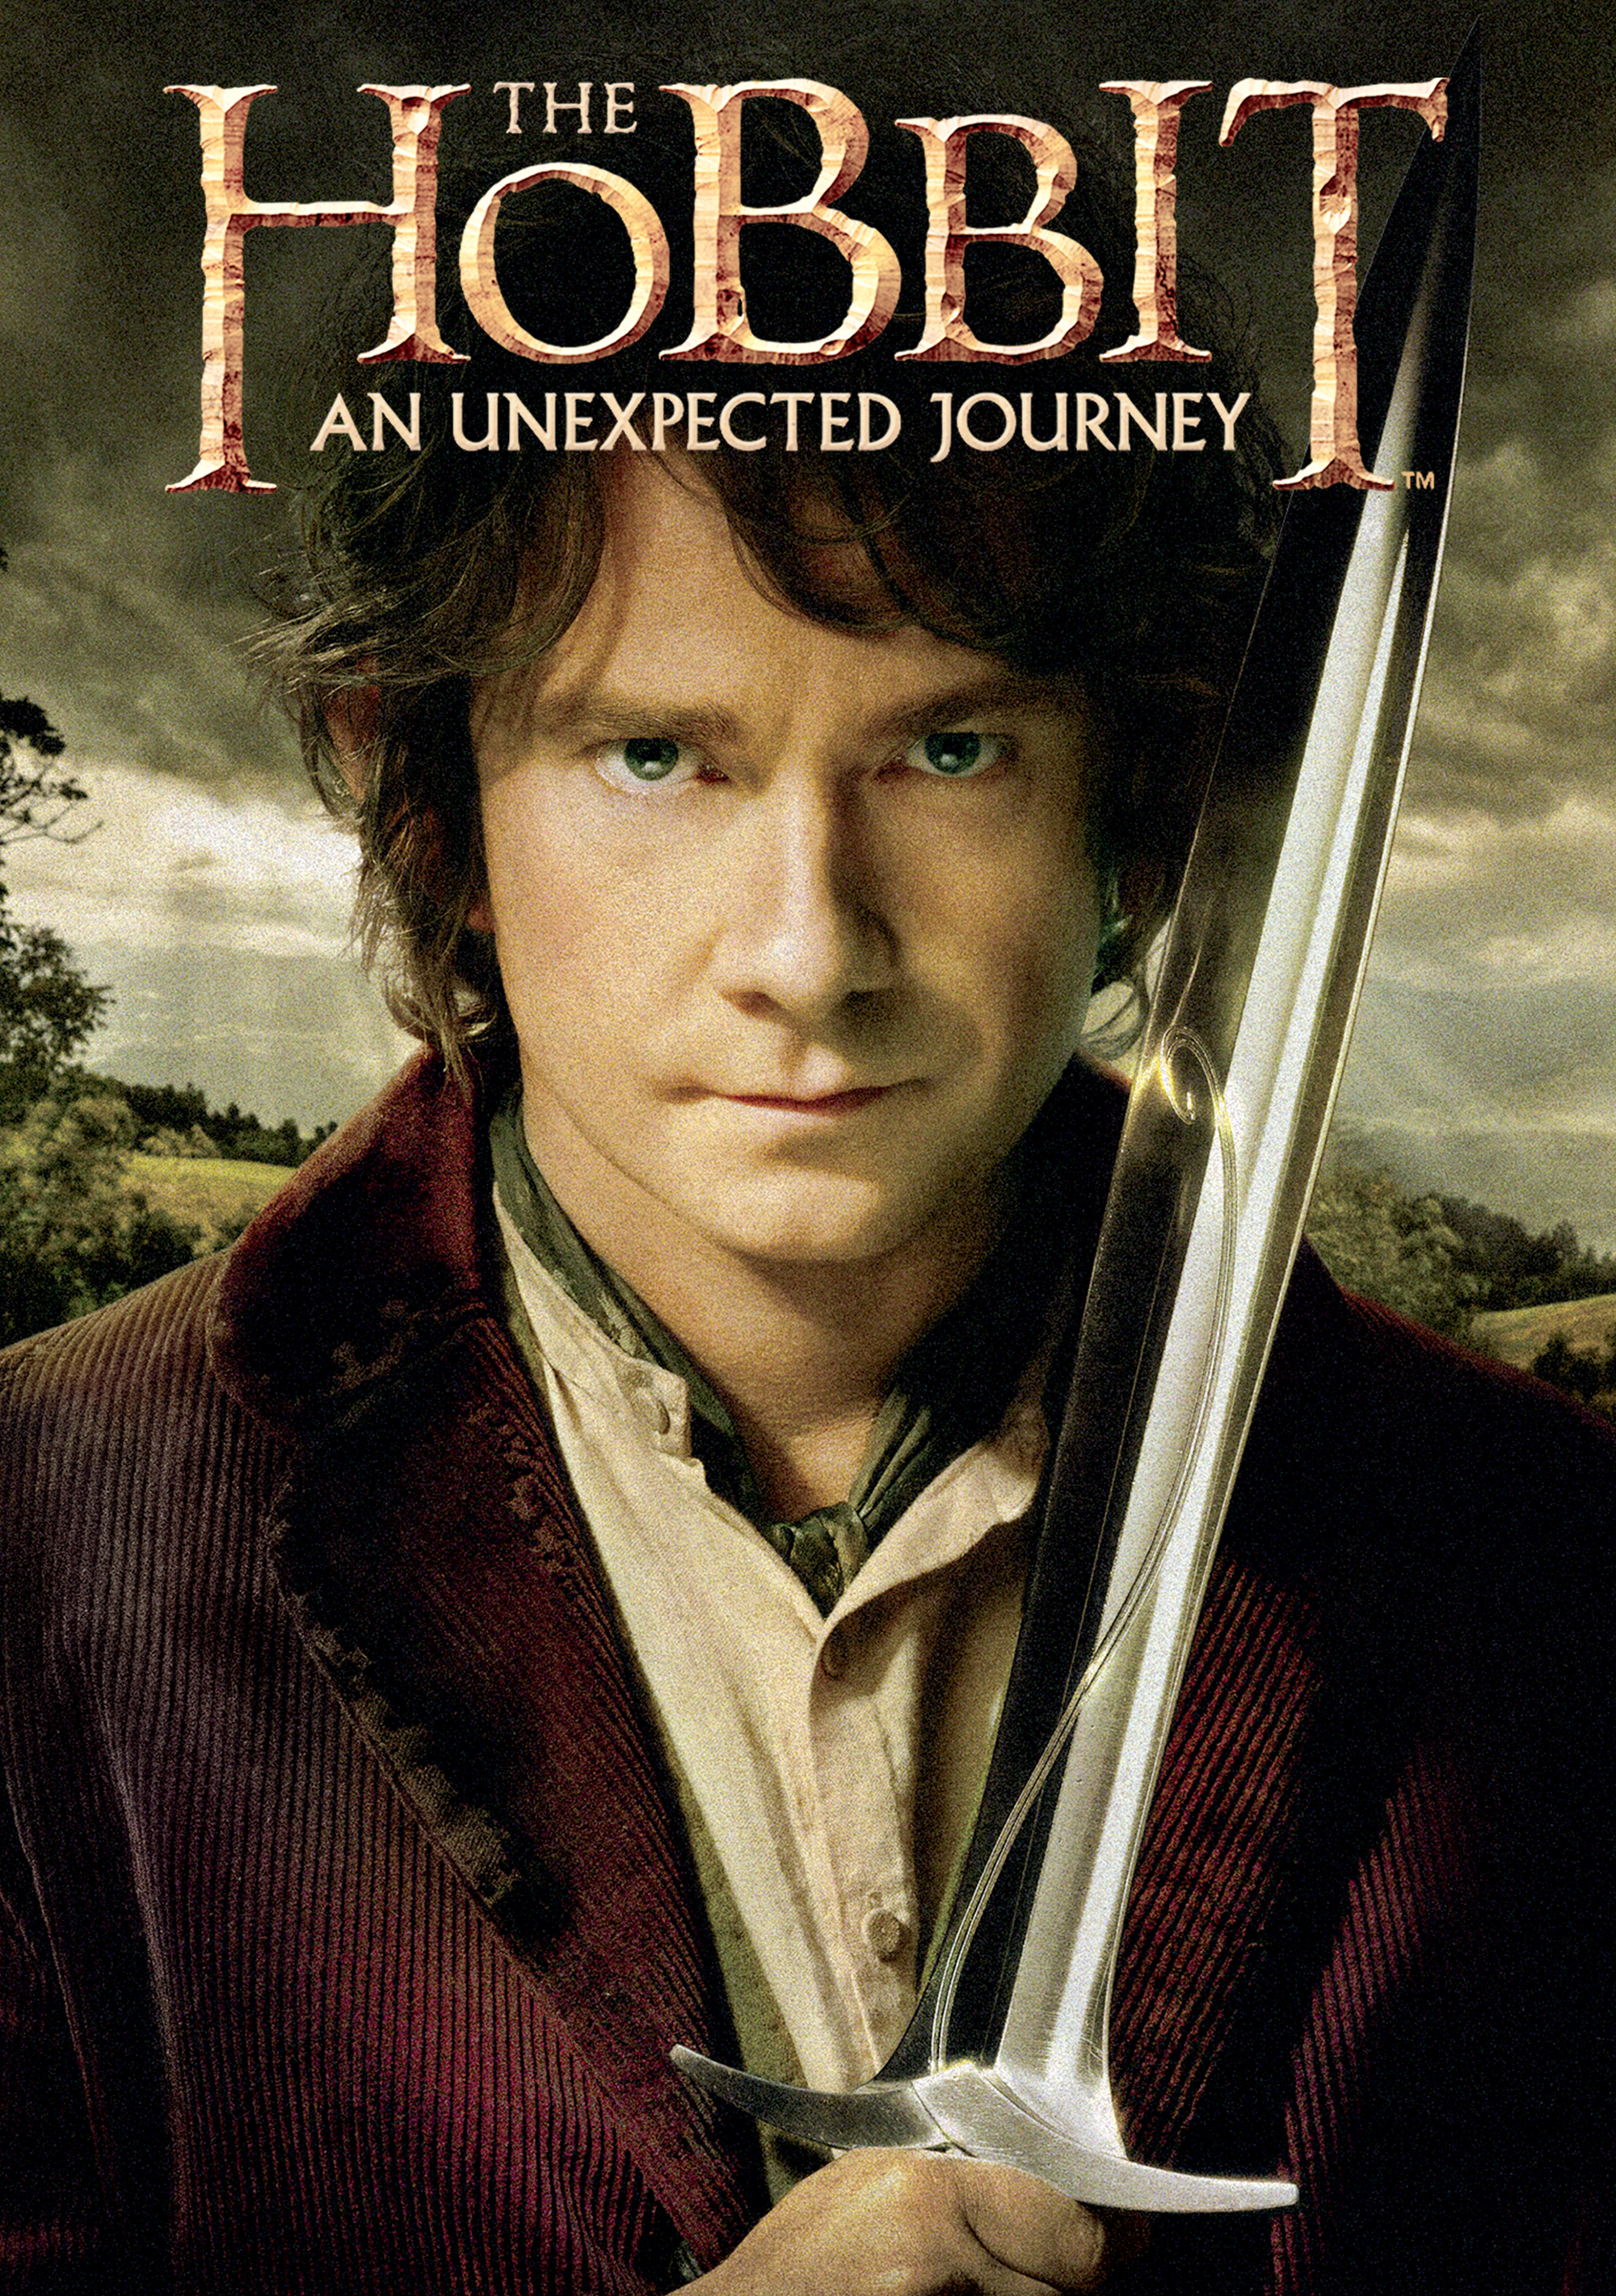 The Hobbit: An Unexpected Journey (2012): Xbox SmartGlass